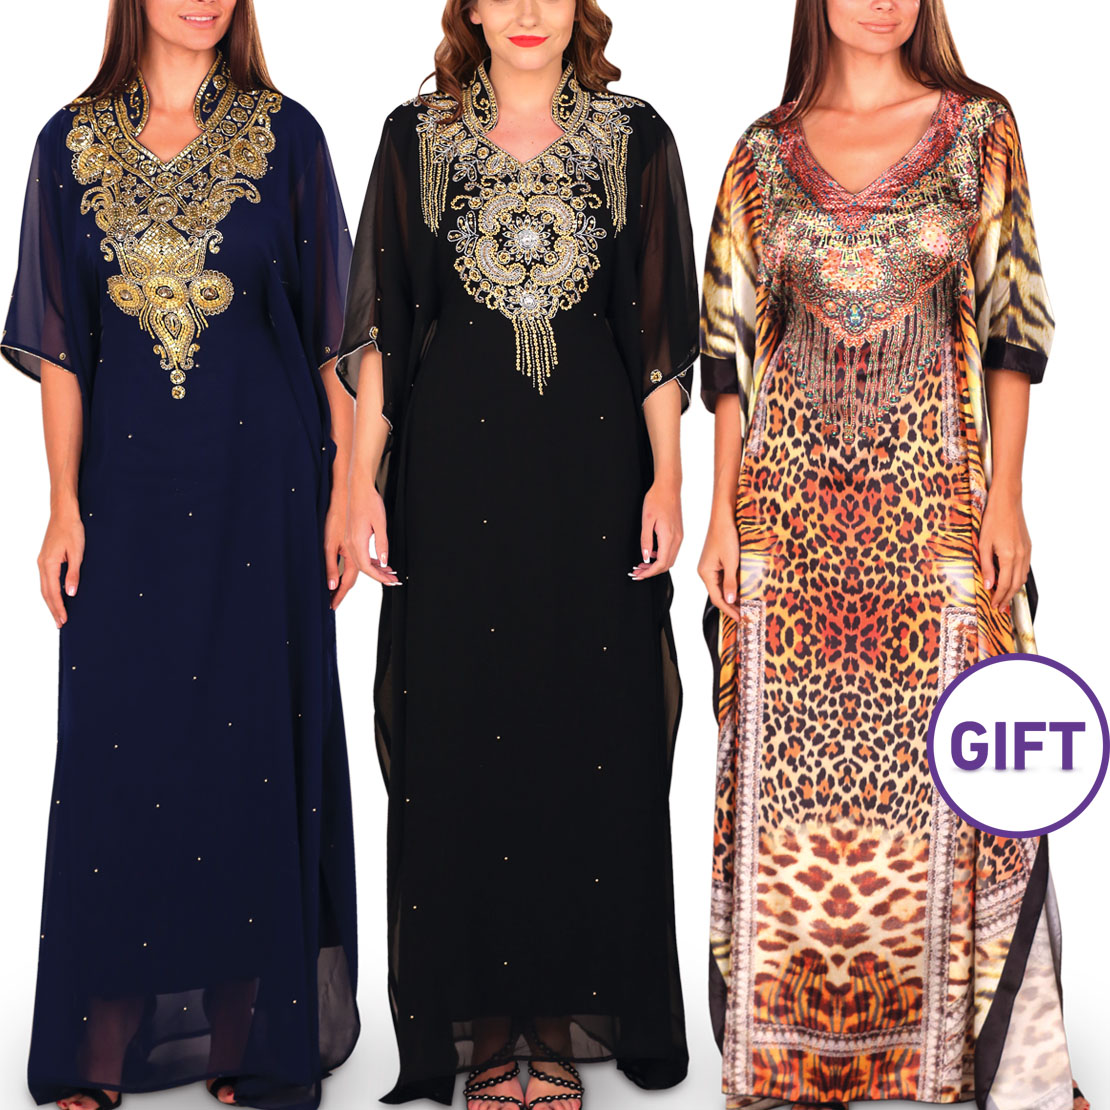 Zeinah Embellished Jalabiya - Pack of 2 & Gift